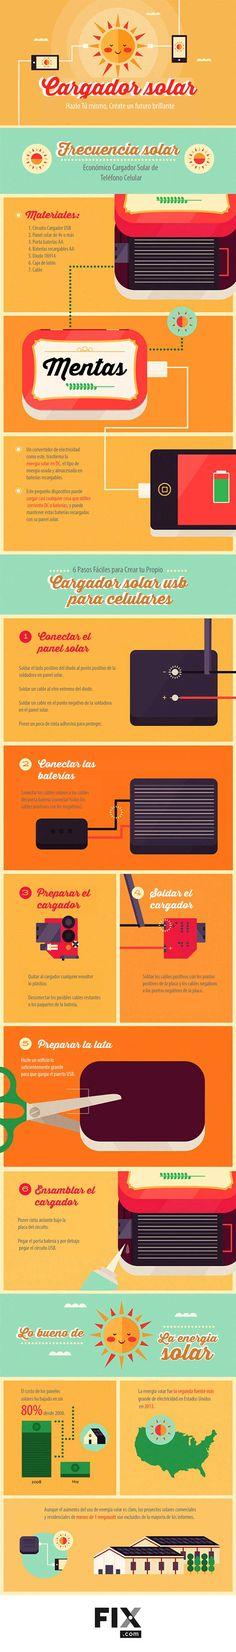 Cargador solar para tu celular #DIY